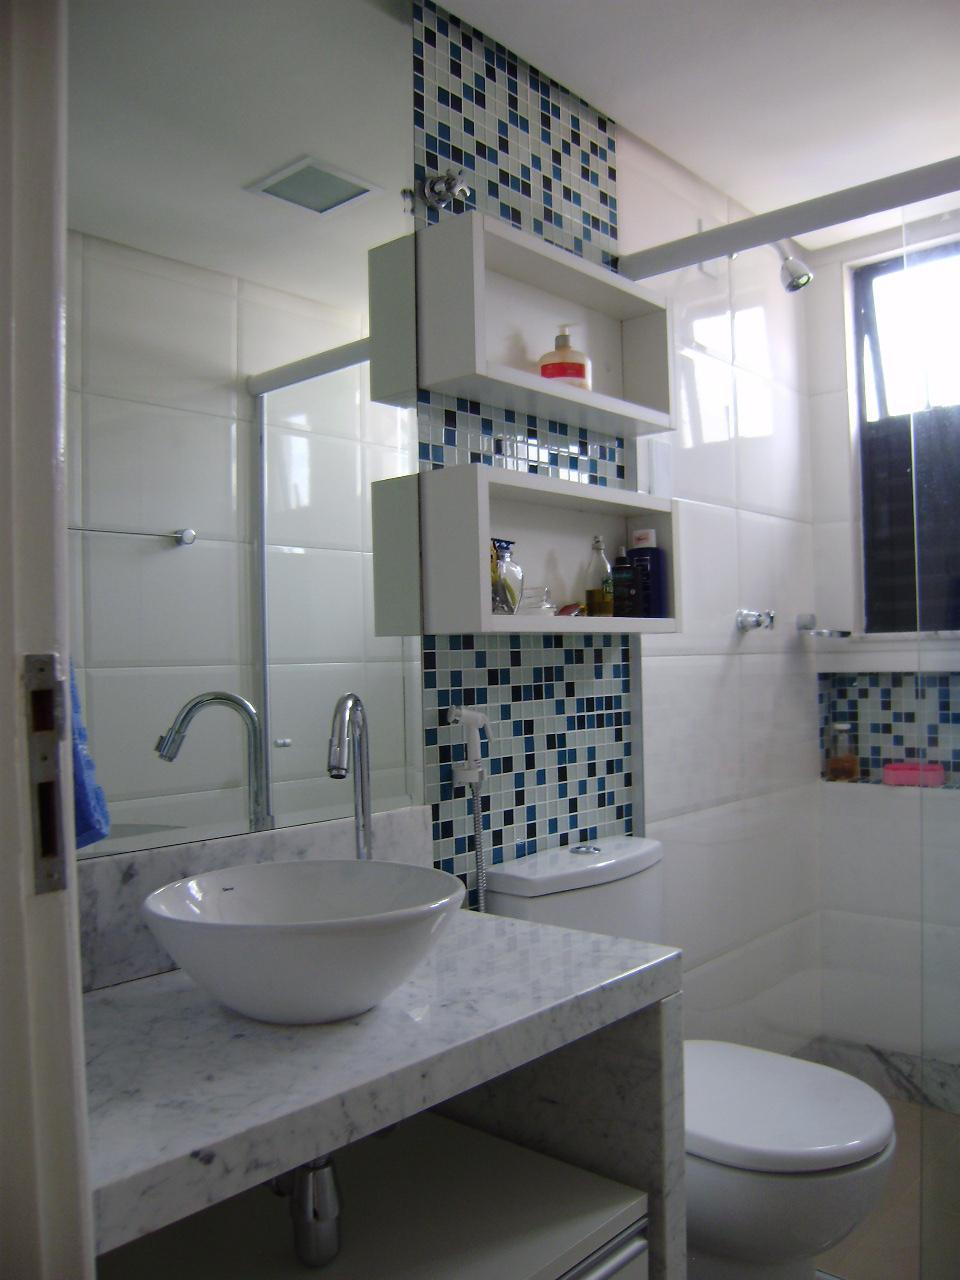 Banheiro Pequeno E Bonito 04 Pictures to pin on Pinterest -> Decoracao De Banheiro Com Pastilhas Azul